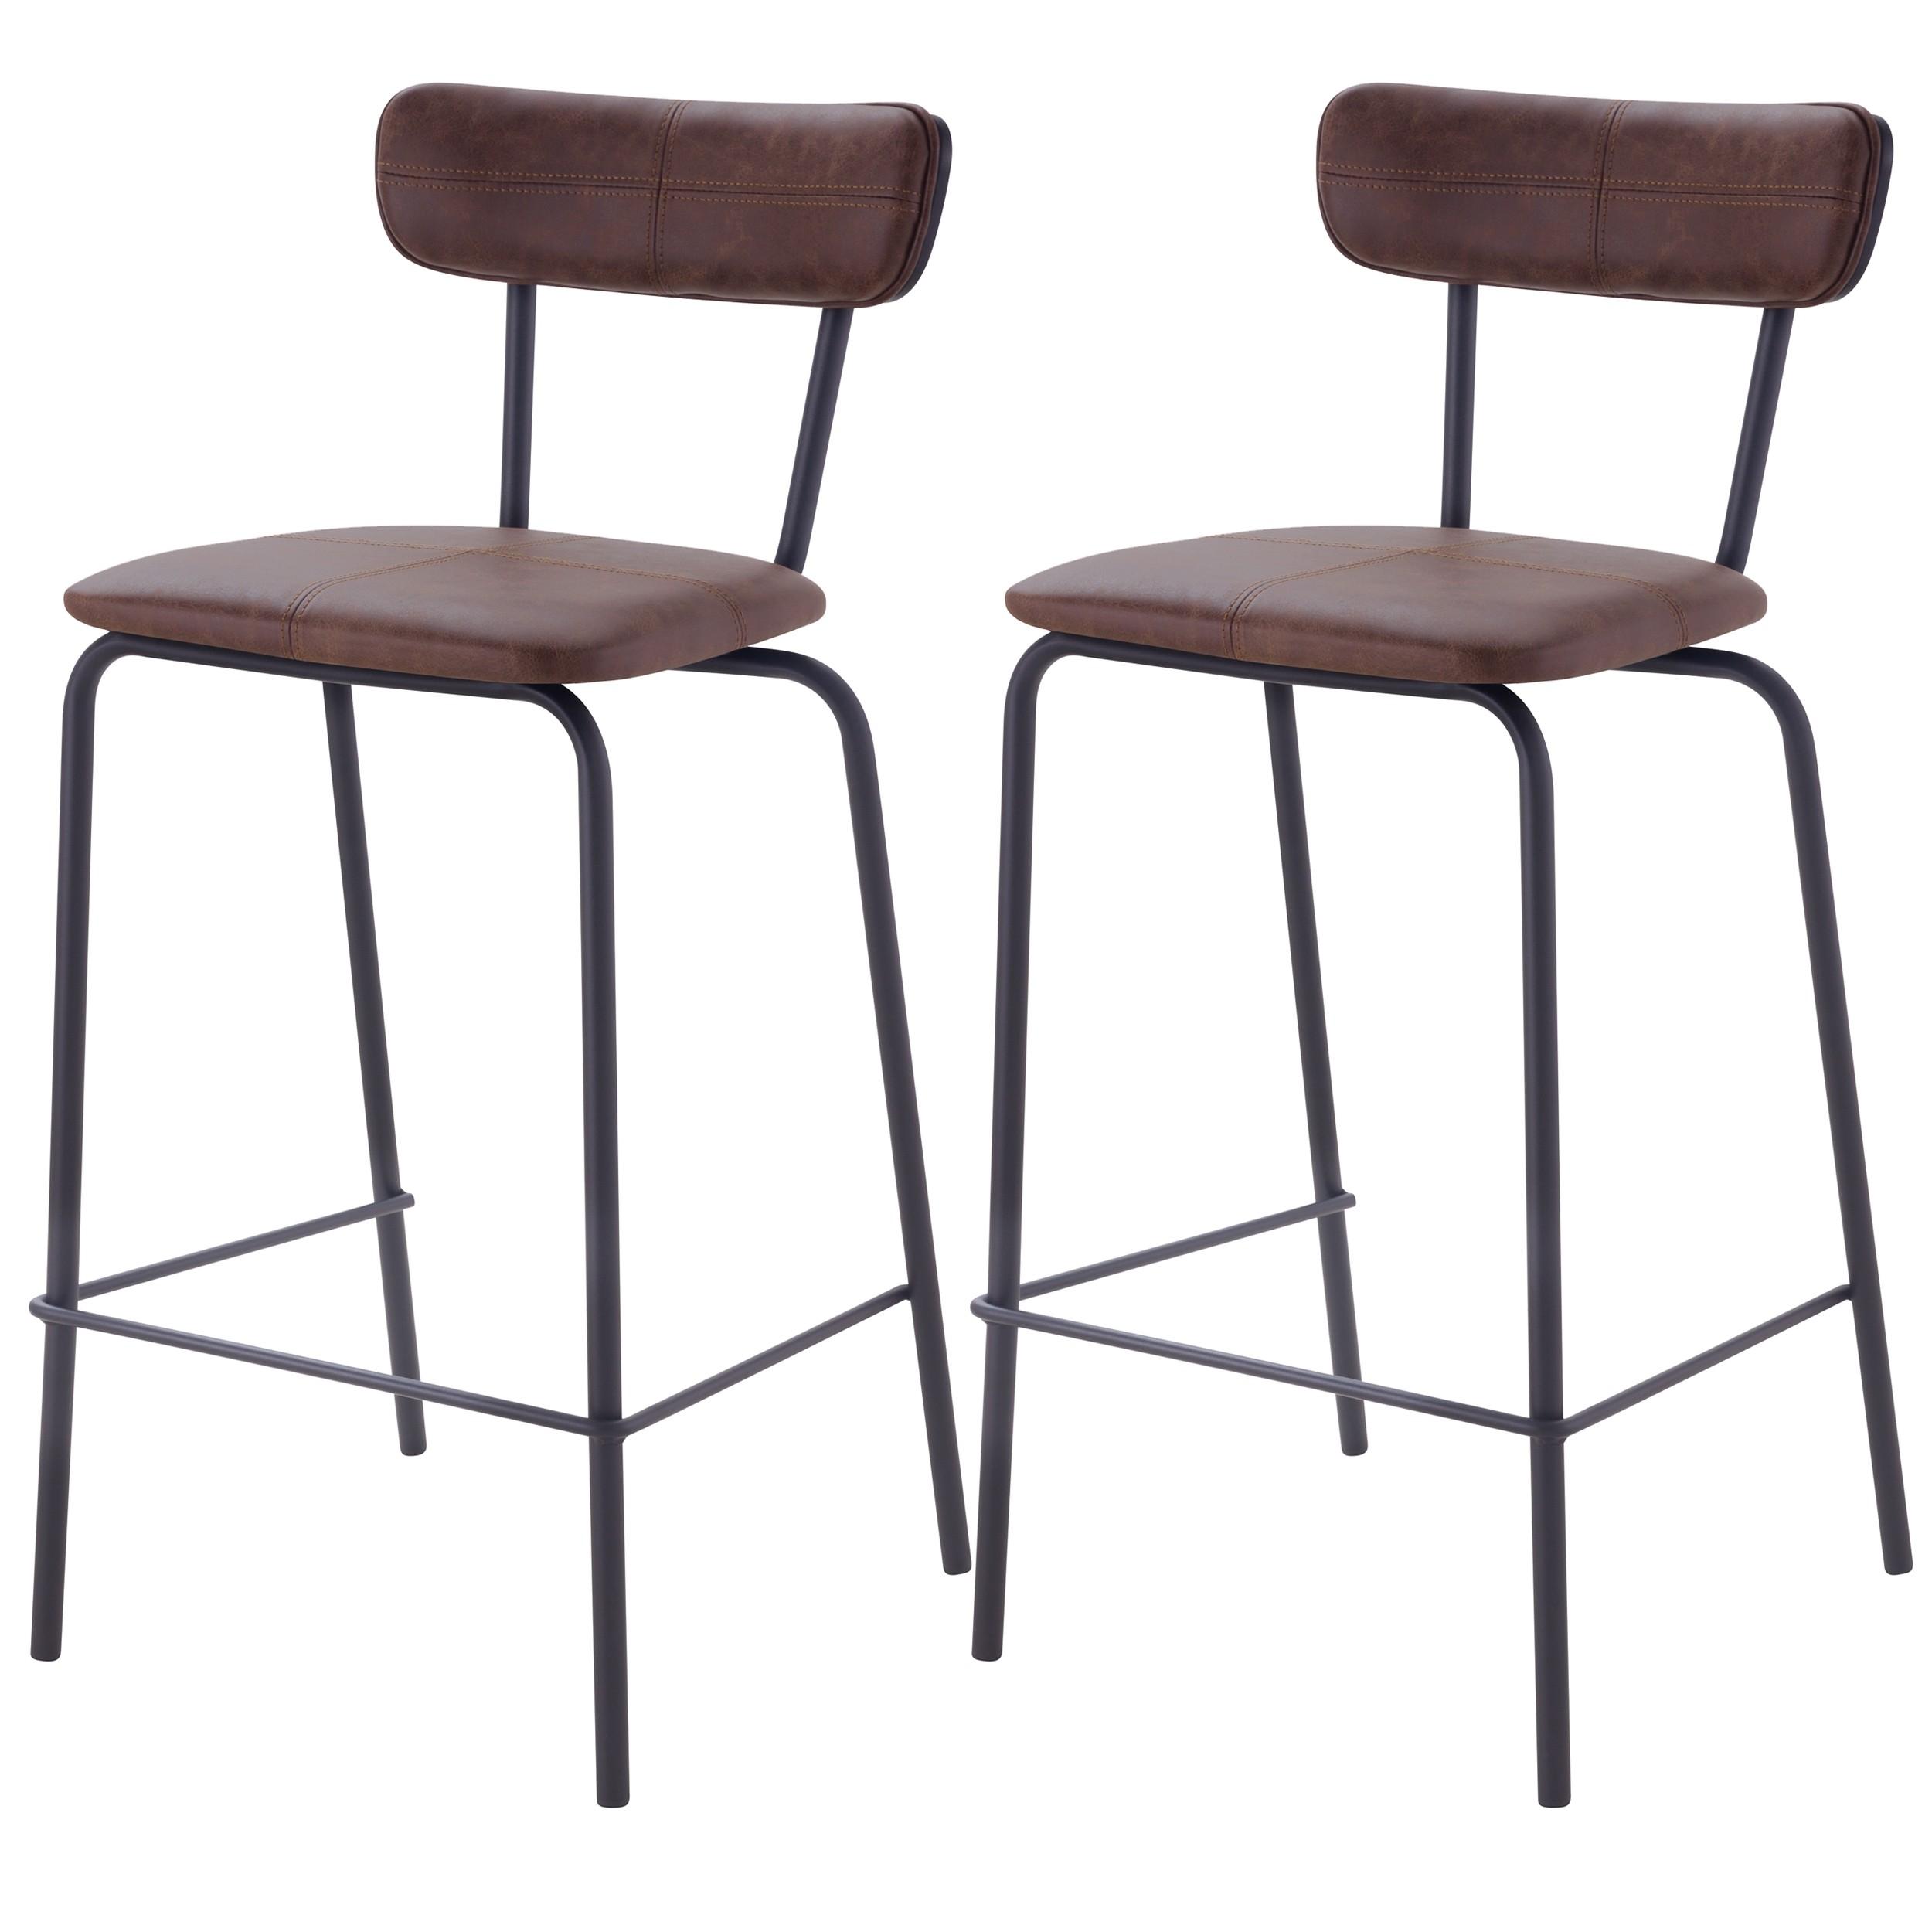 acheter chaise de bar marron fonce cuir synthetique